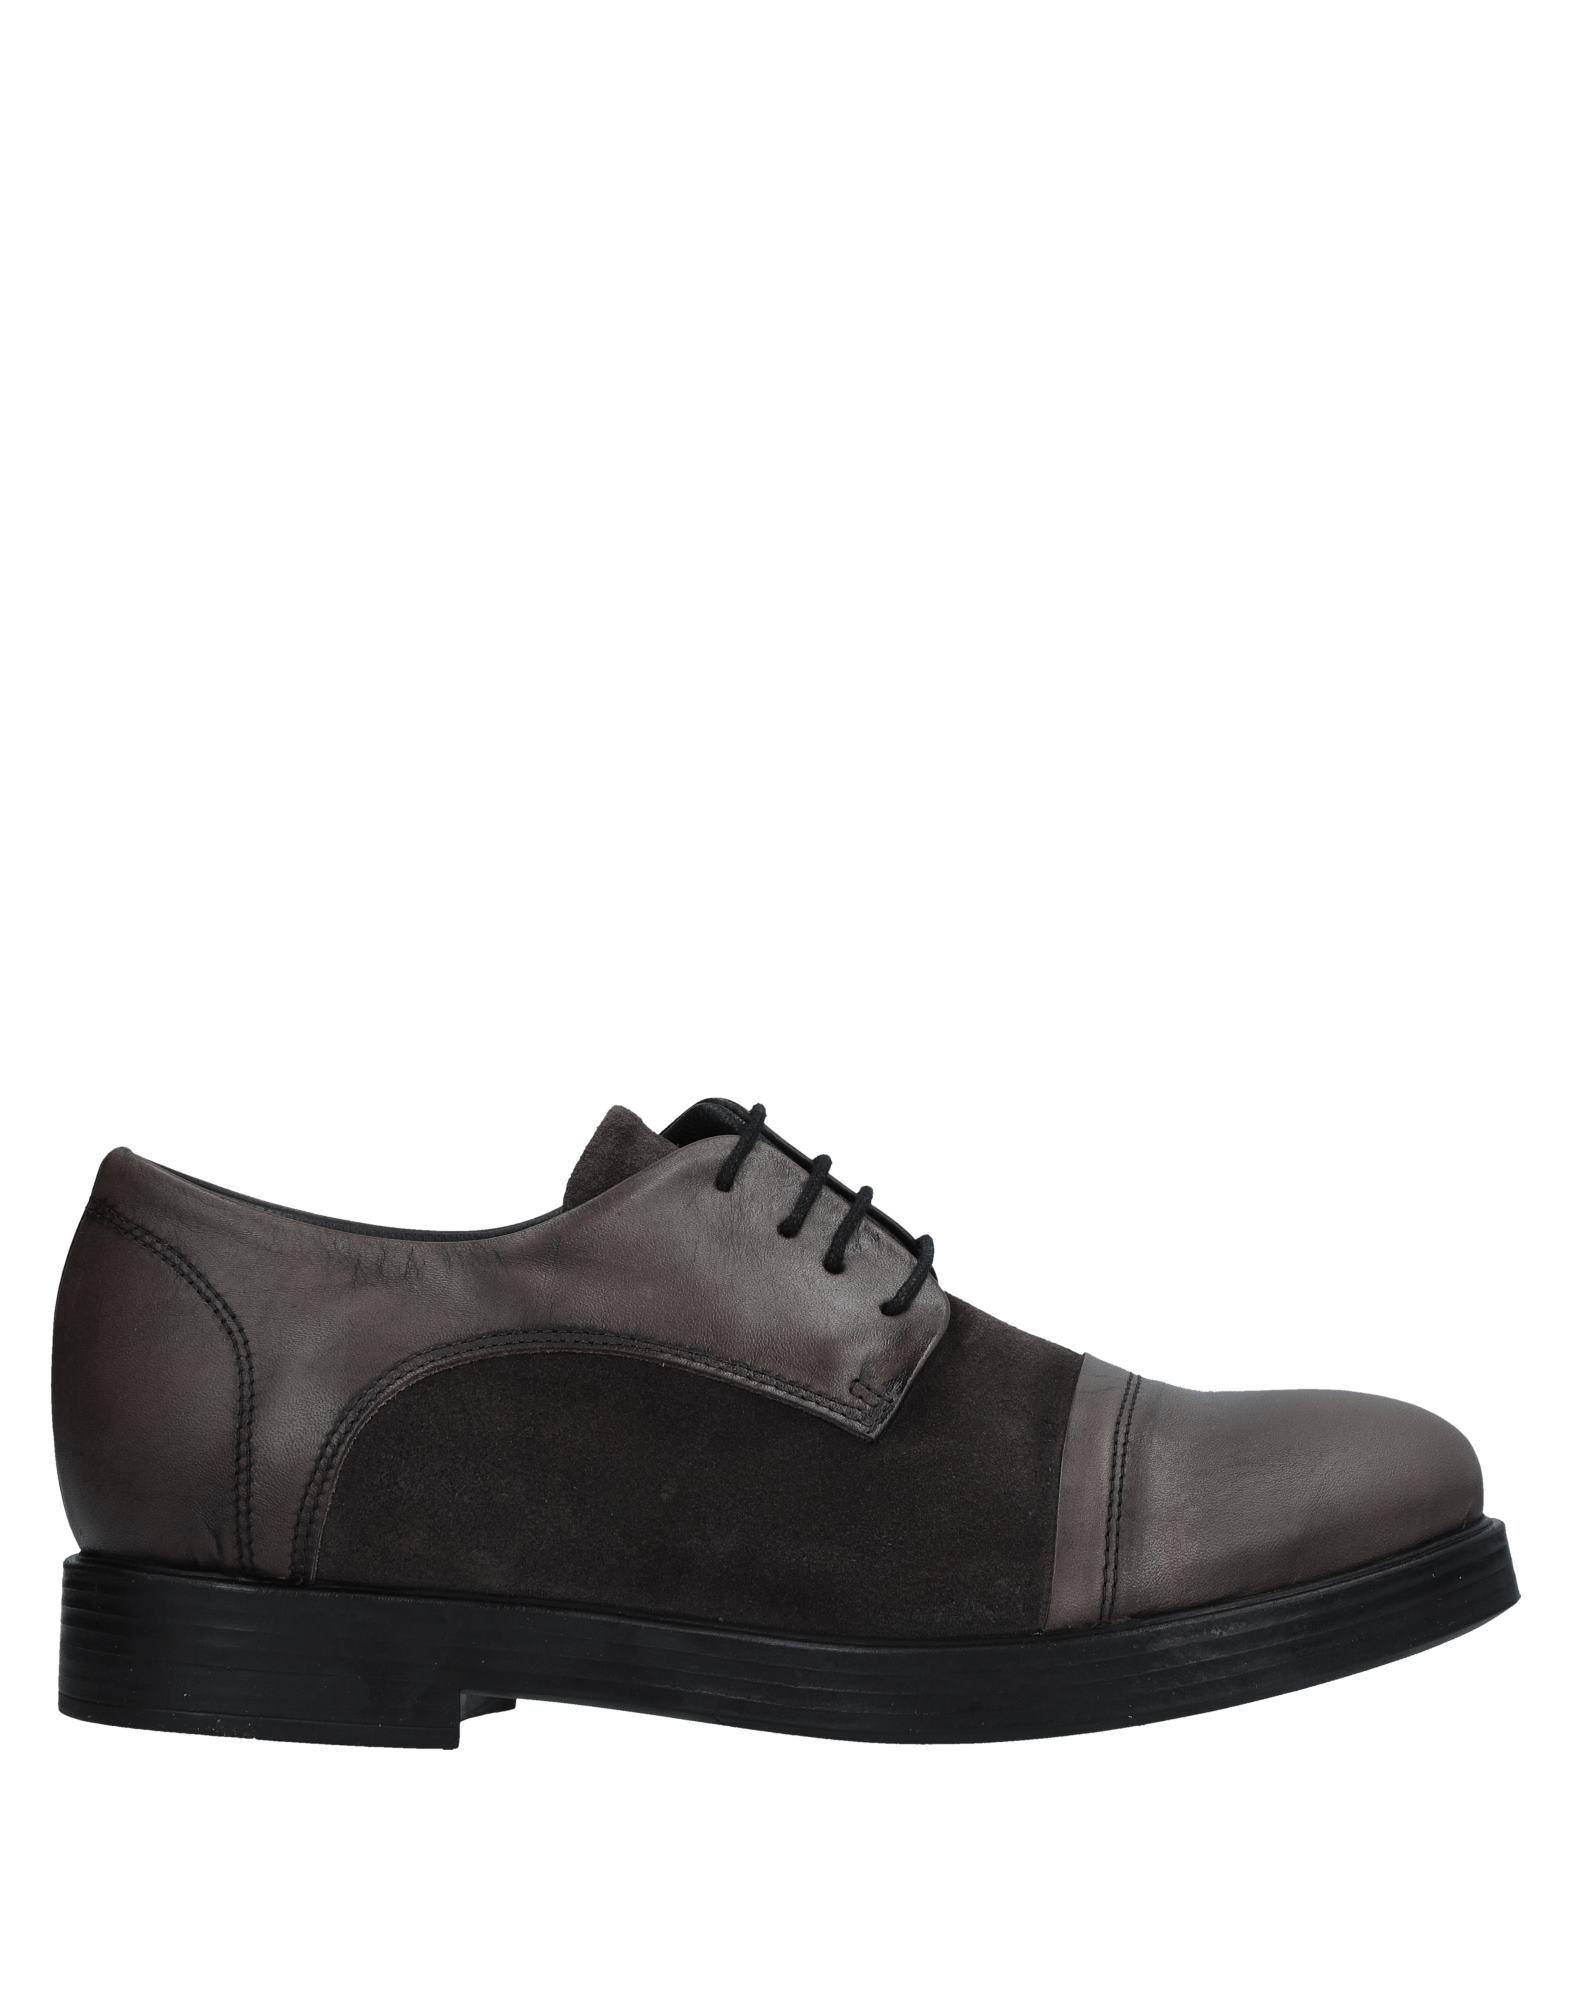 Lilimill Schnürschuhe Damen  11523861FW Gute Qualität beliebte Schuhe